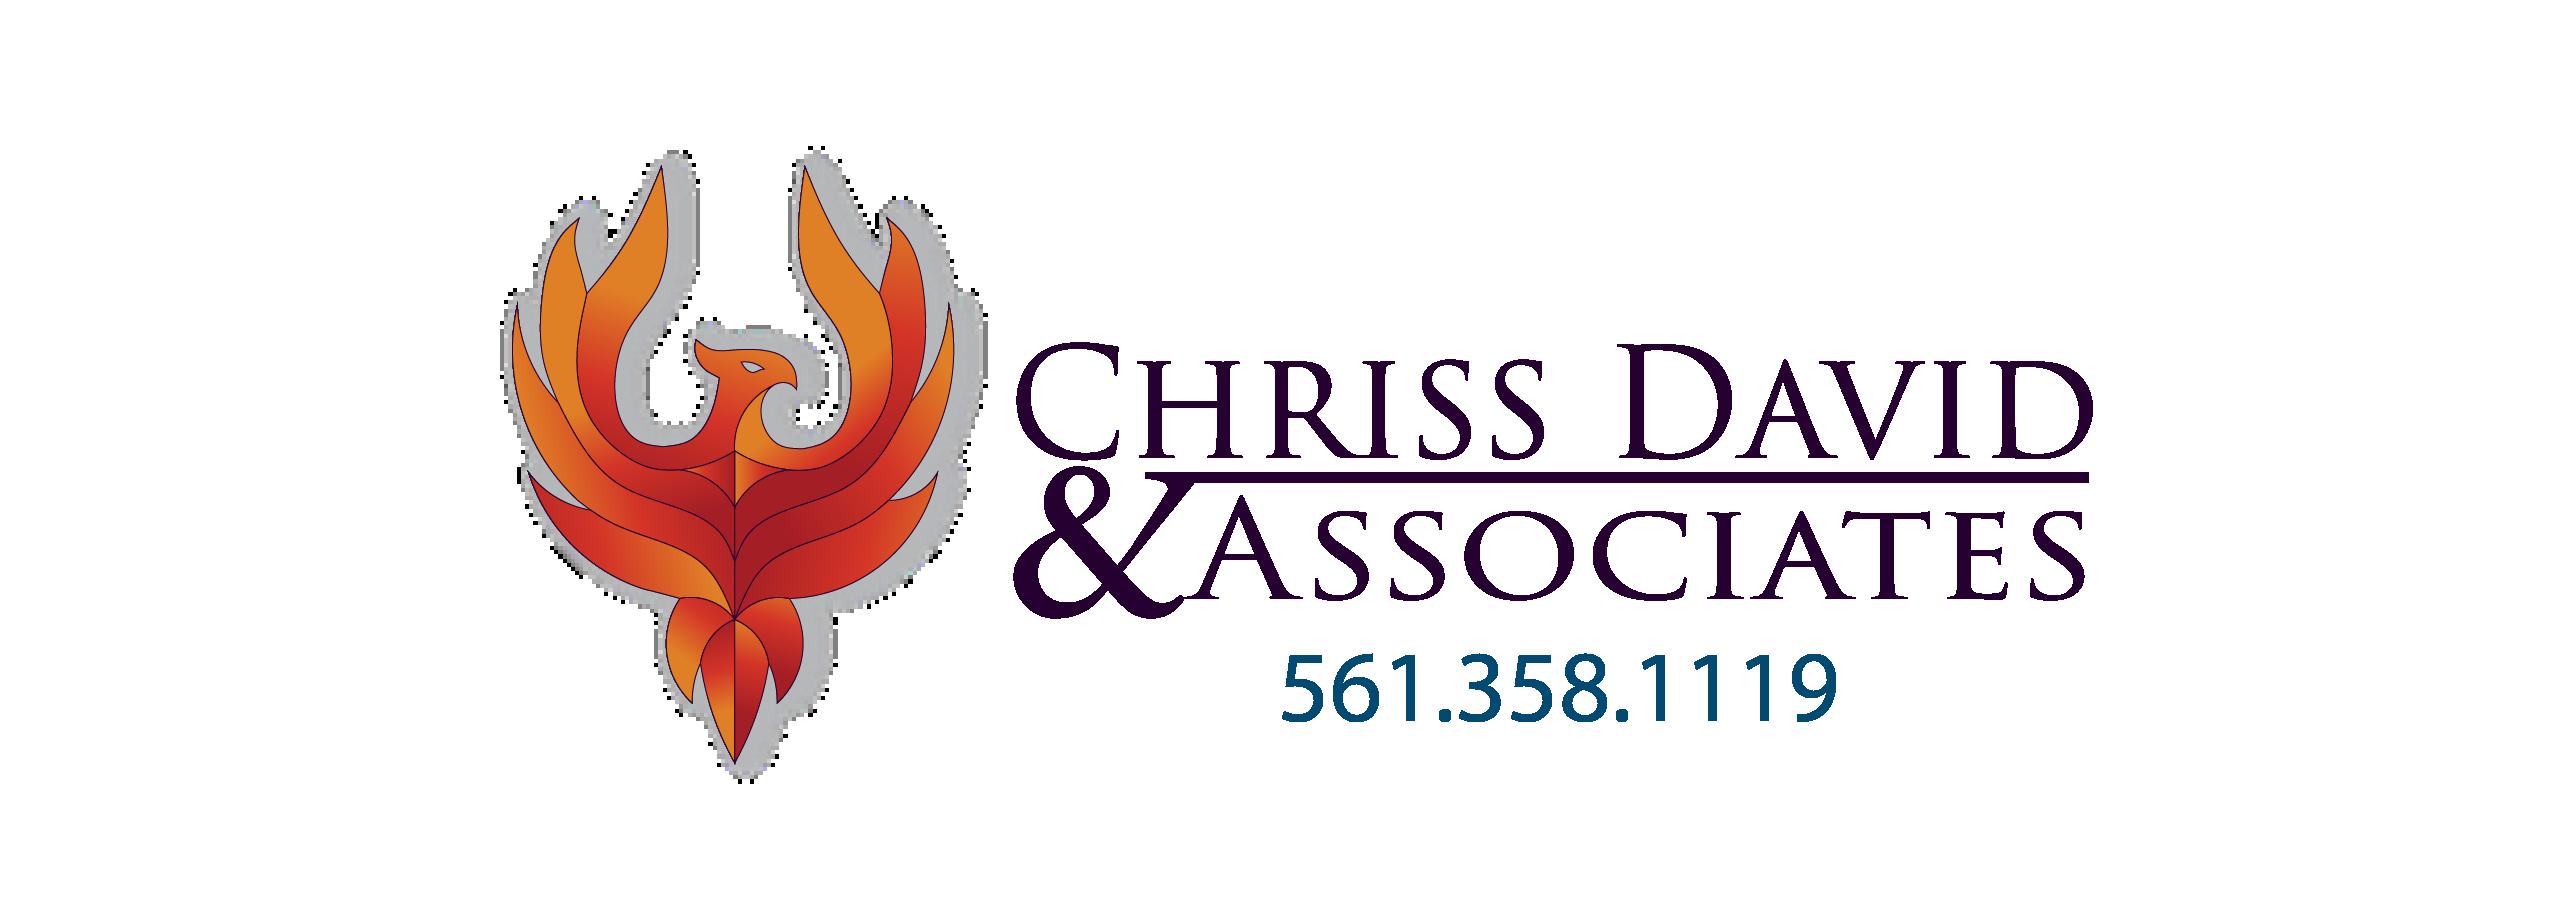 Chriss David & Associates